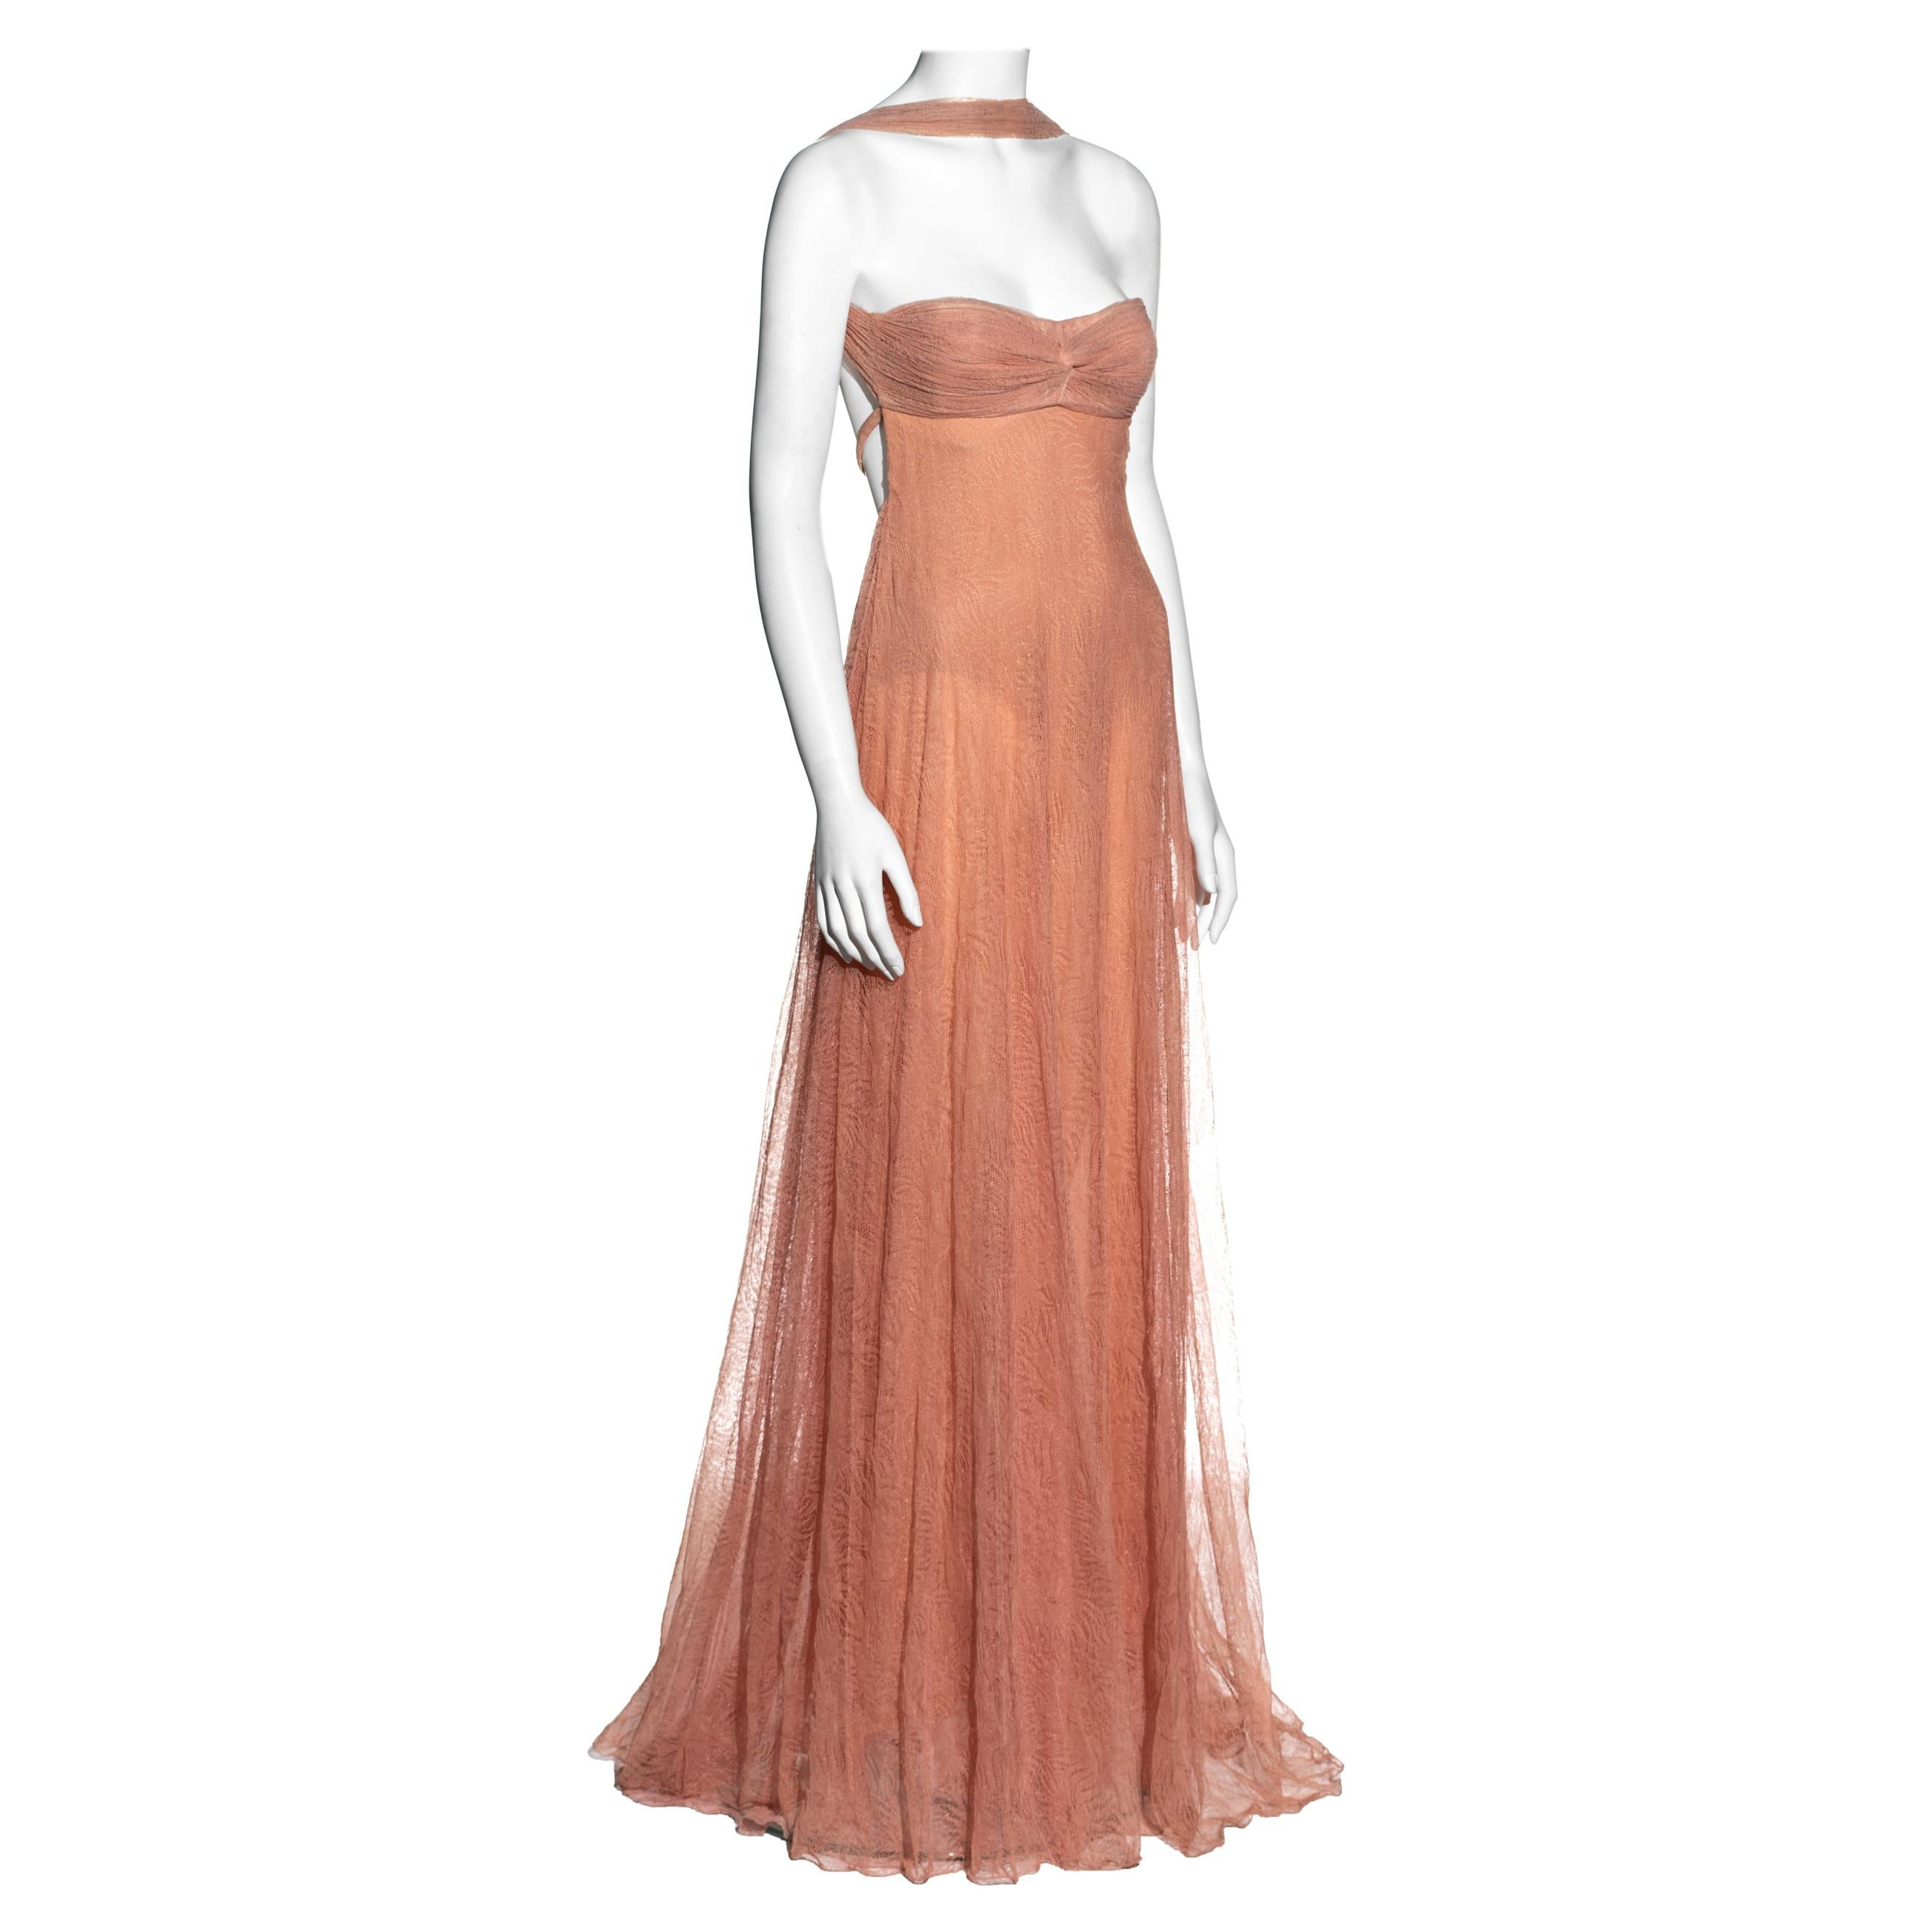 Gianni Versace peach cotton lace halter neck evening gown, fw 2000